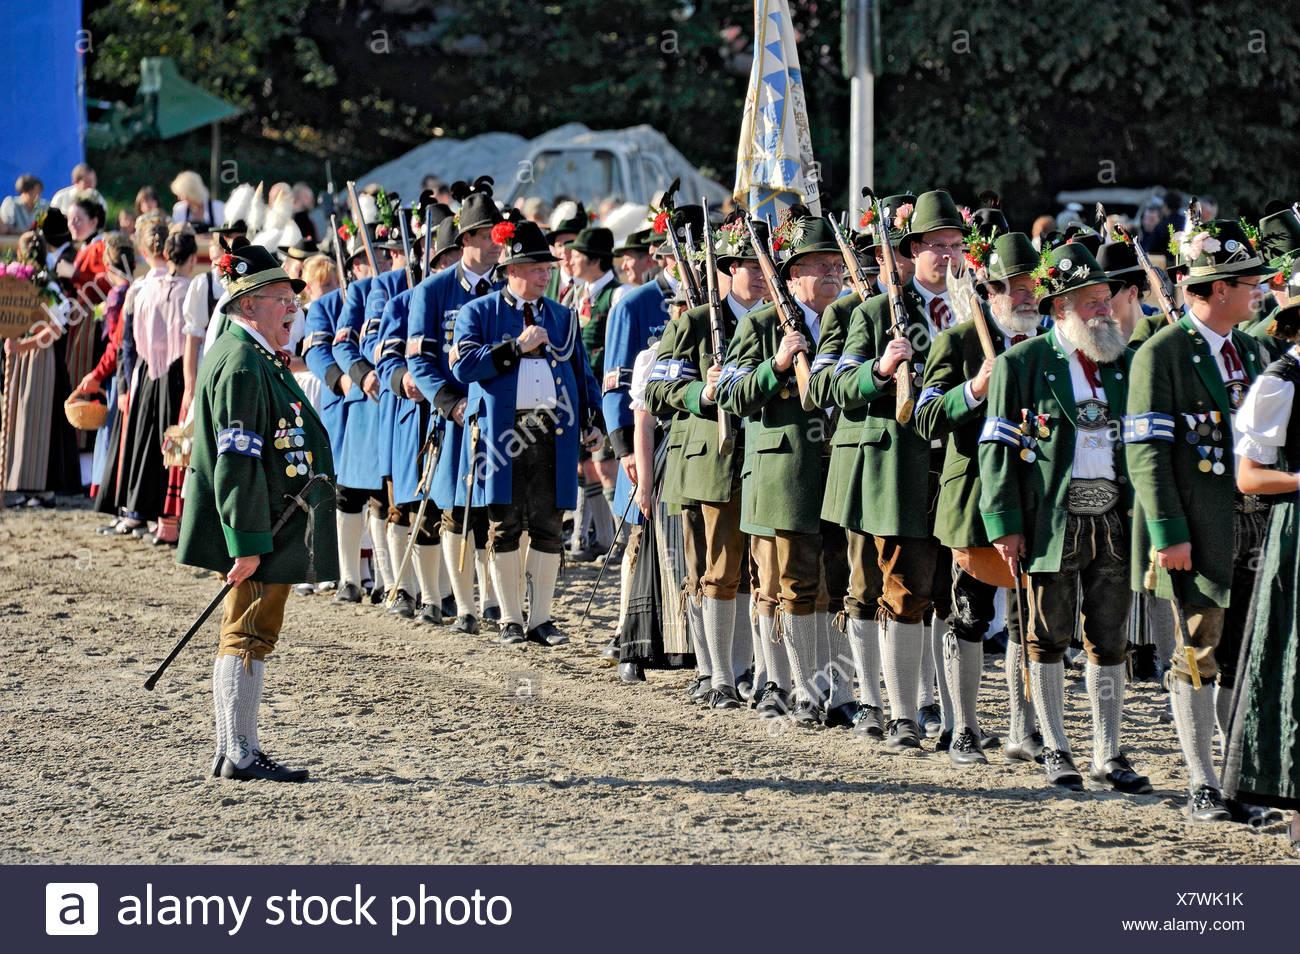 Parade of the gun clubs, members wearing traditional Bavarian costumes, fairground, Oktoberfest festival, Munich, Upper Bavaria - Stock Image